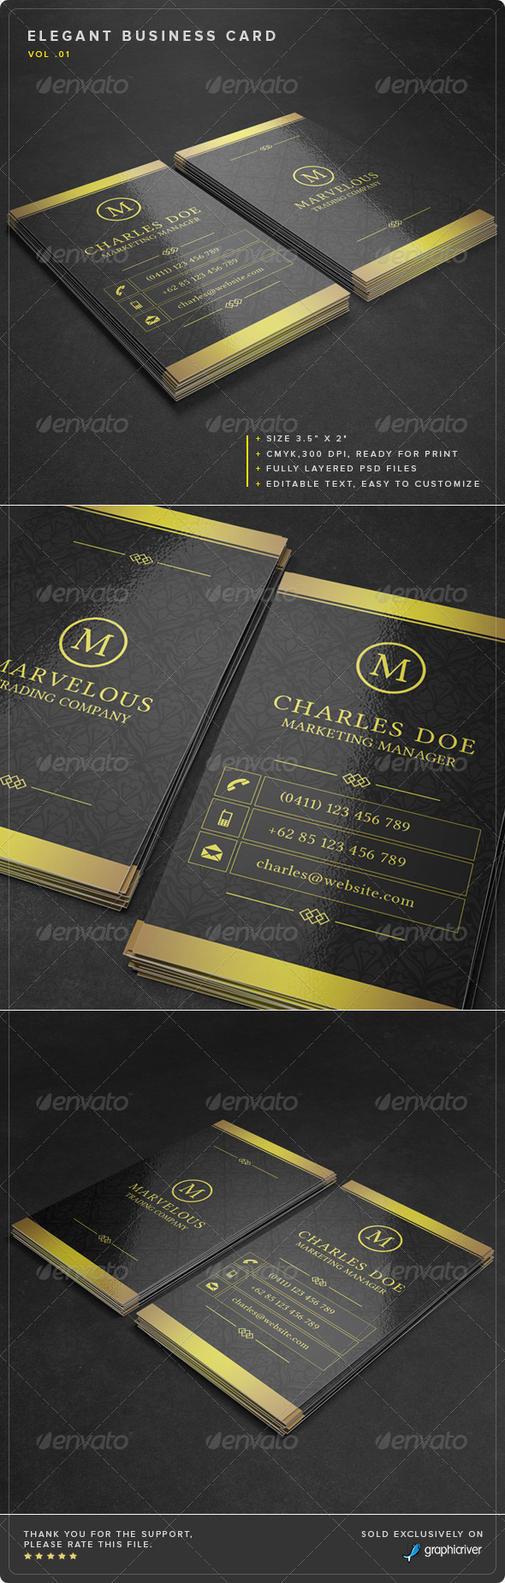 Elegant Business Card by Junaedy-Ponda